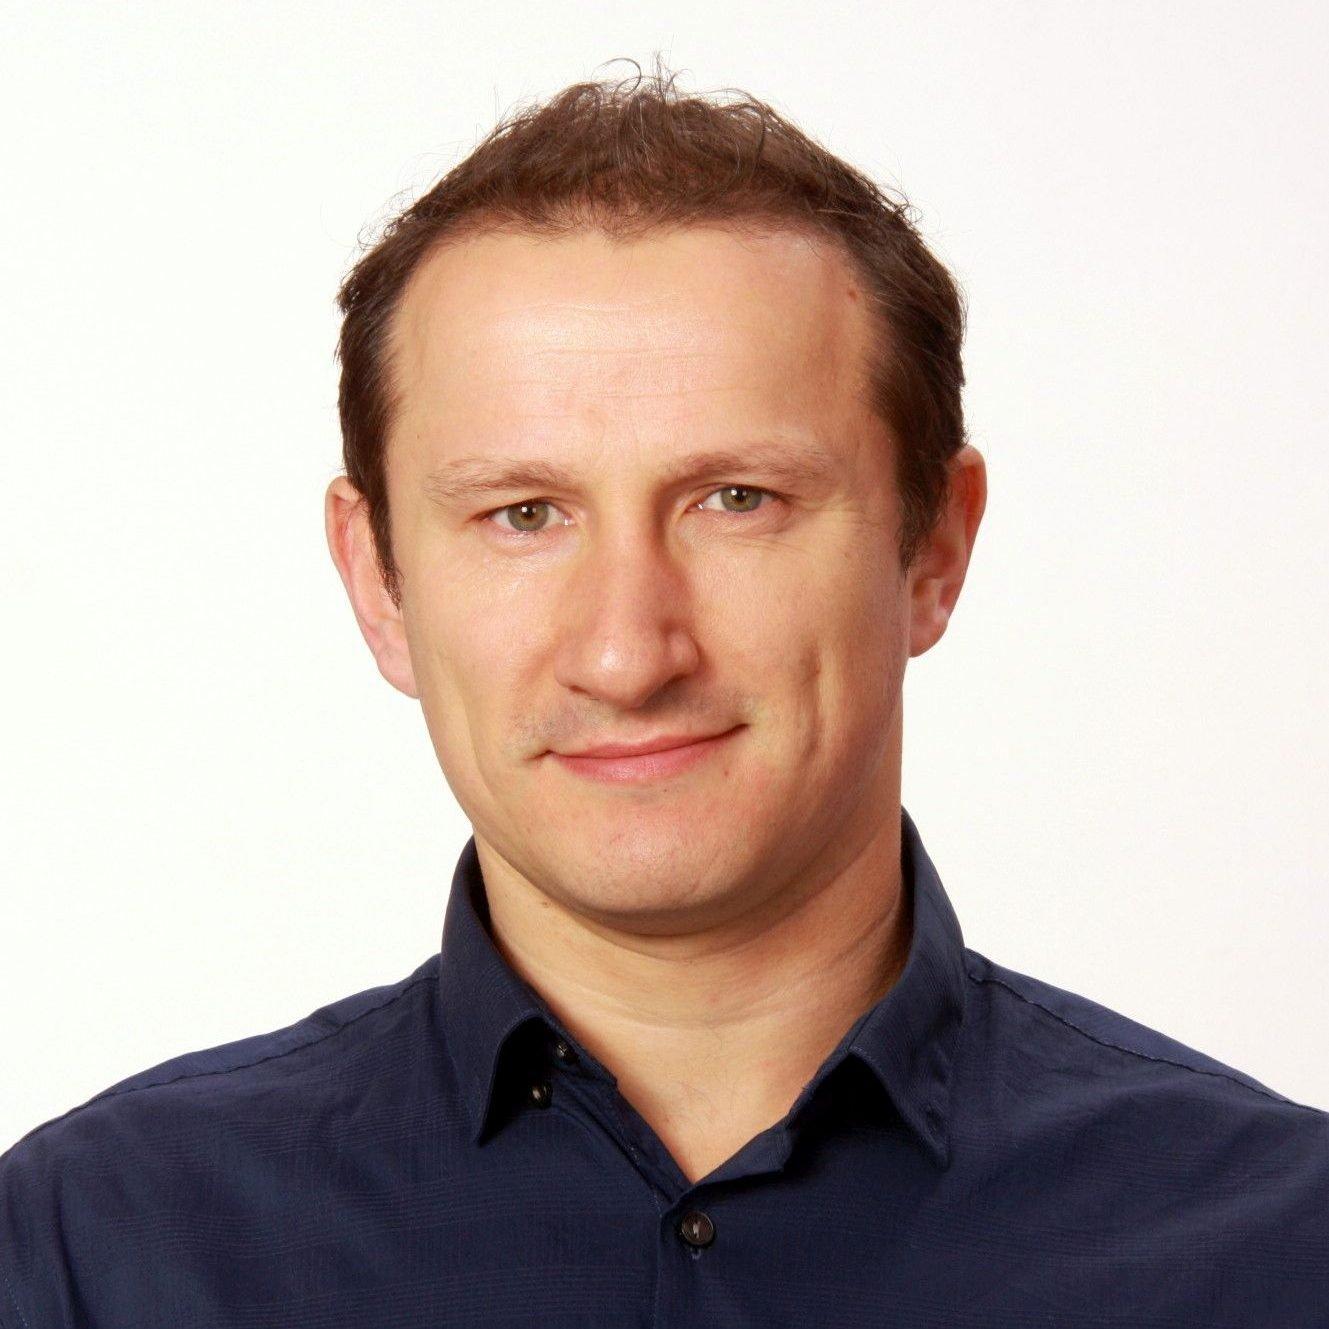 Marko Szilveszter Macskovich